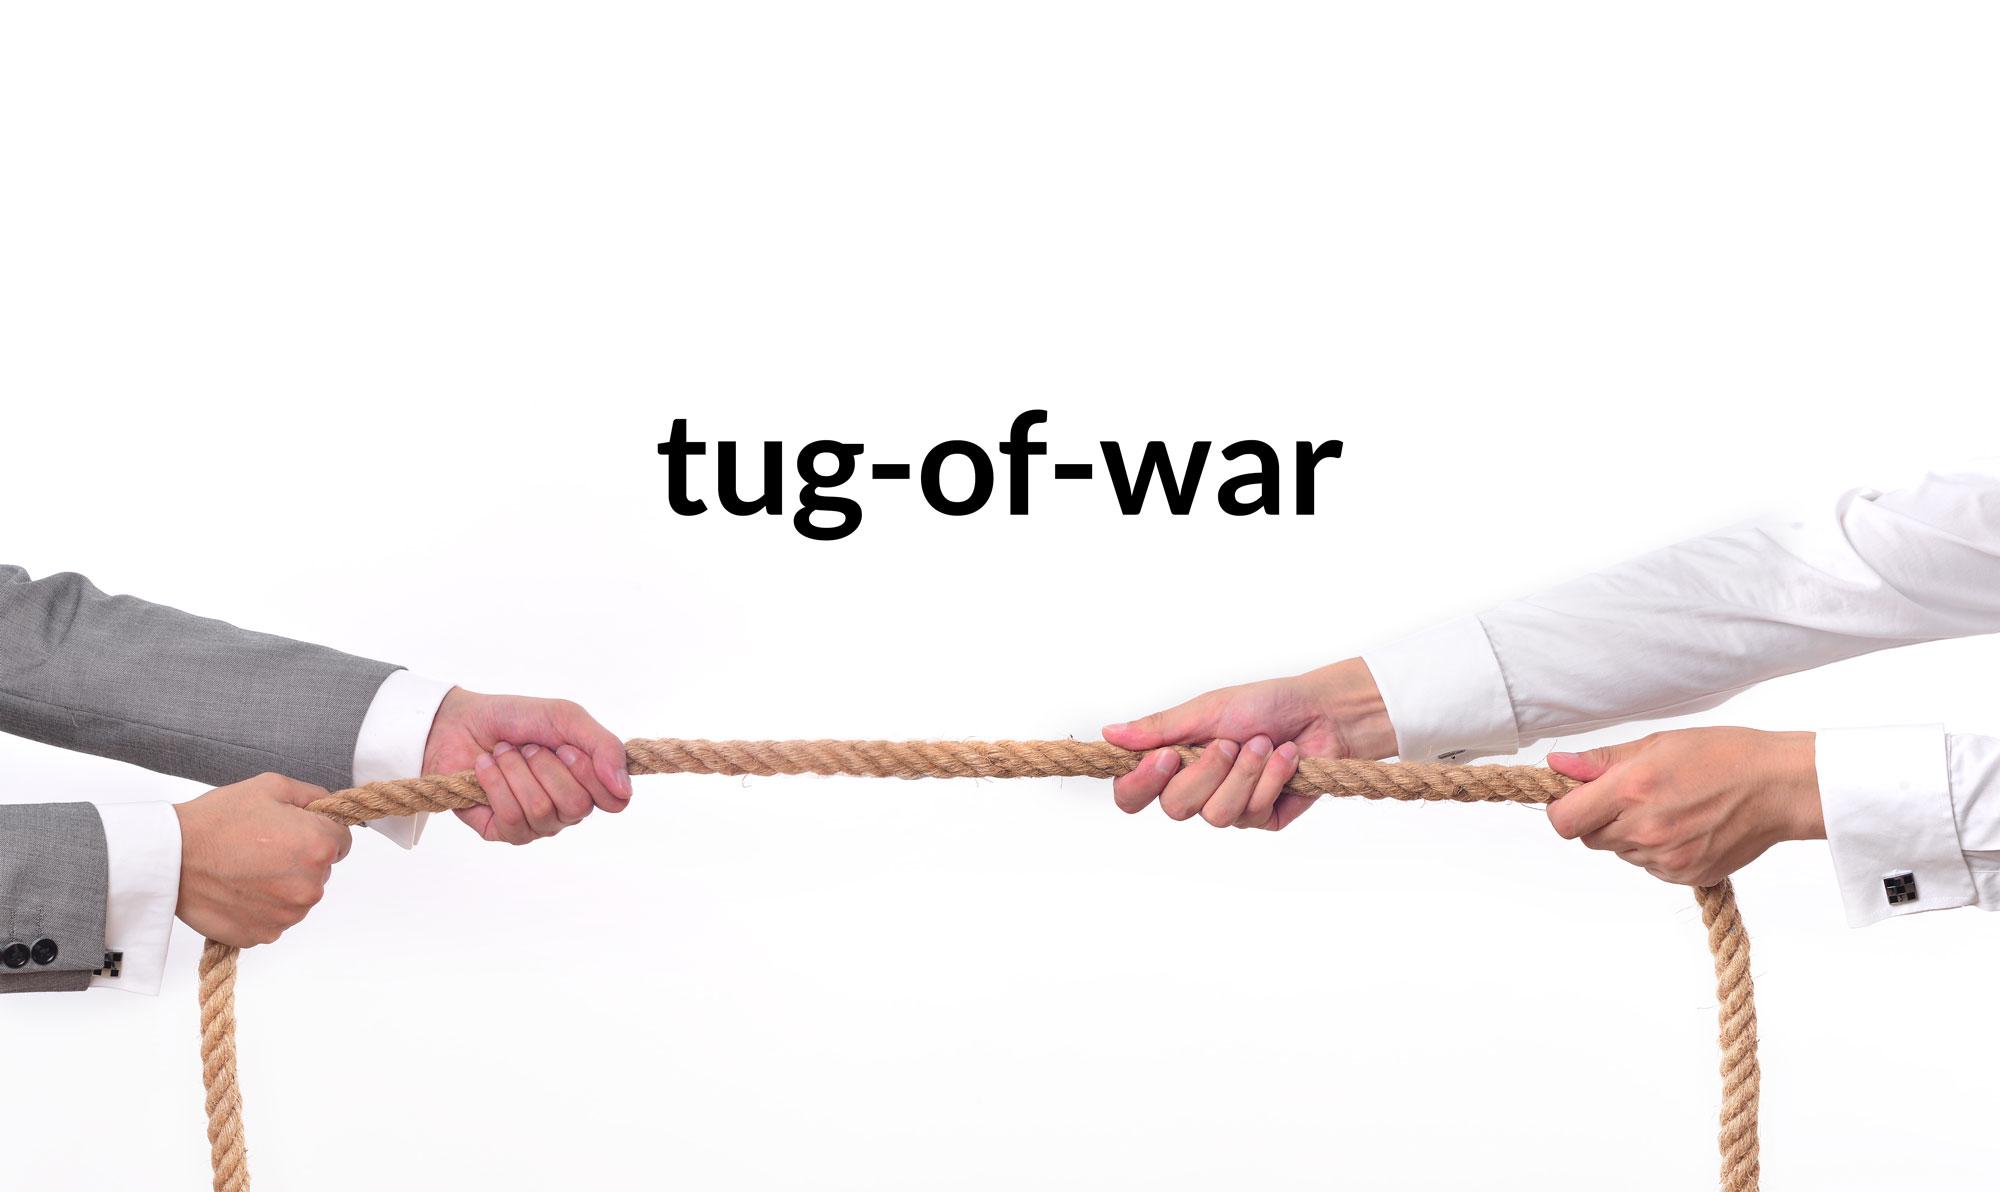 tugofwar